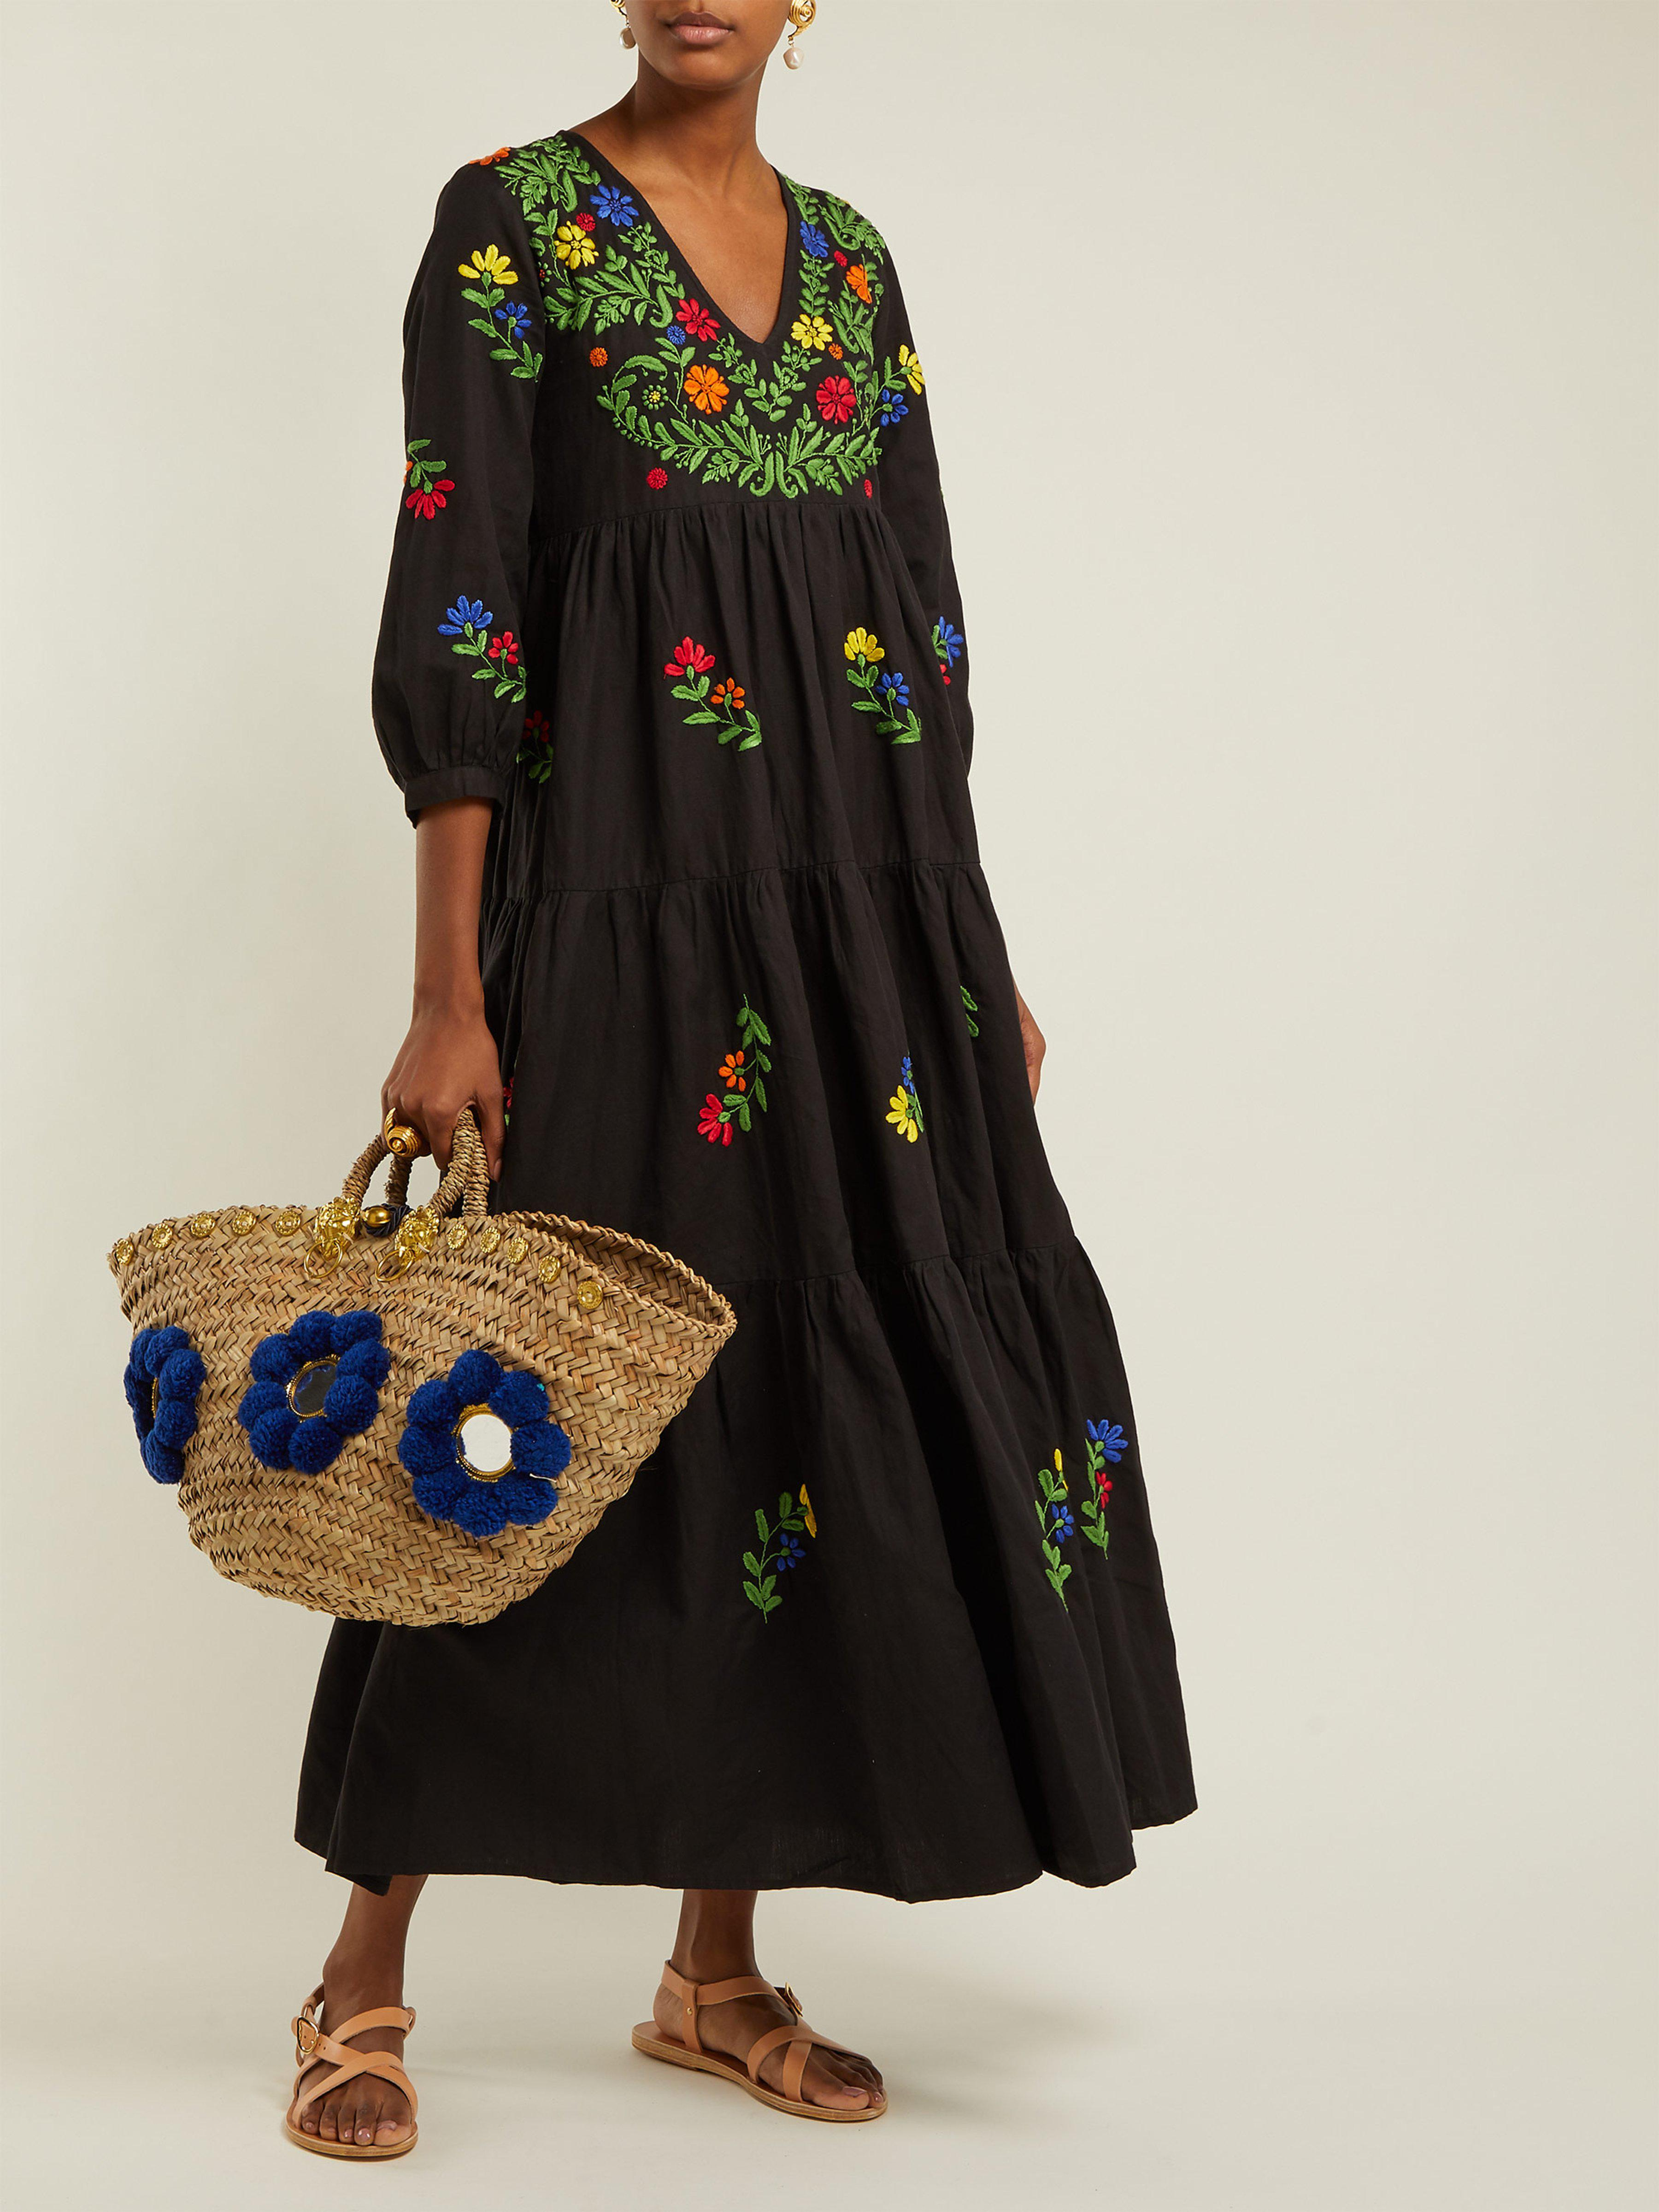 6e5f6c114f3 Muzungu Sisters Frangipani Embroidered Cotton Dress in Black - Lyst